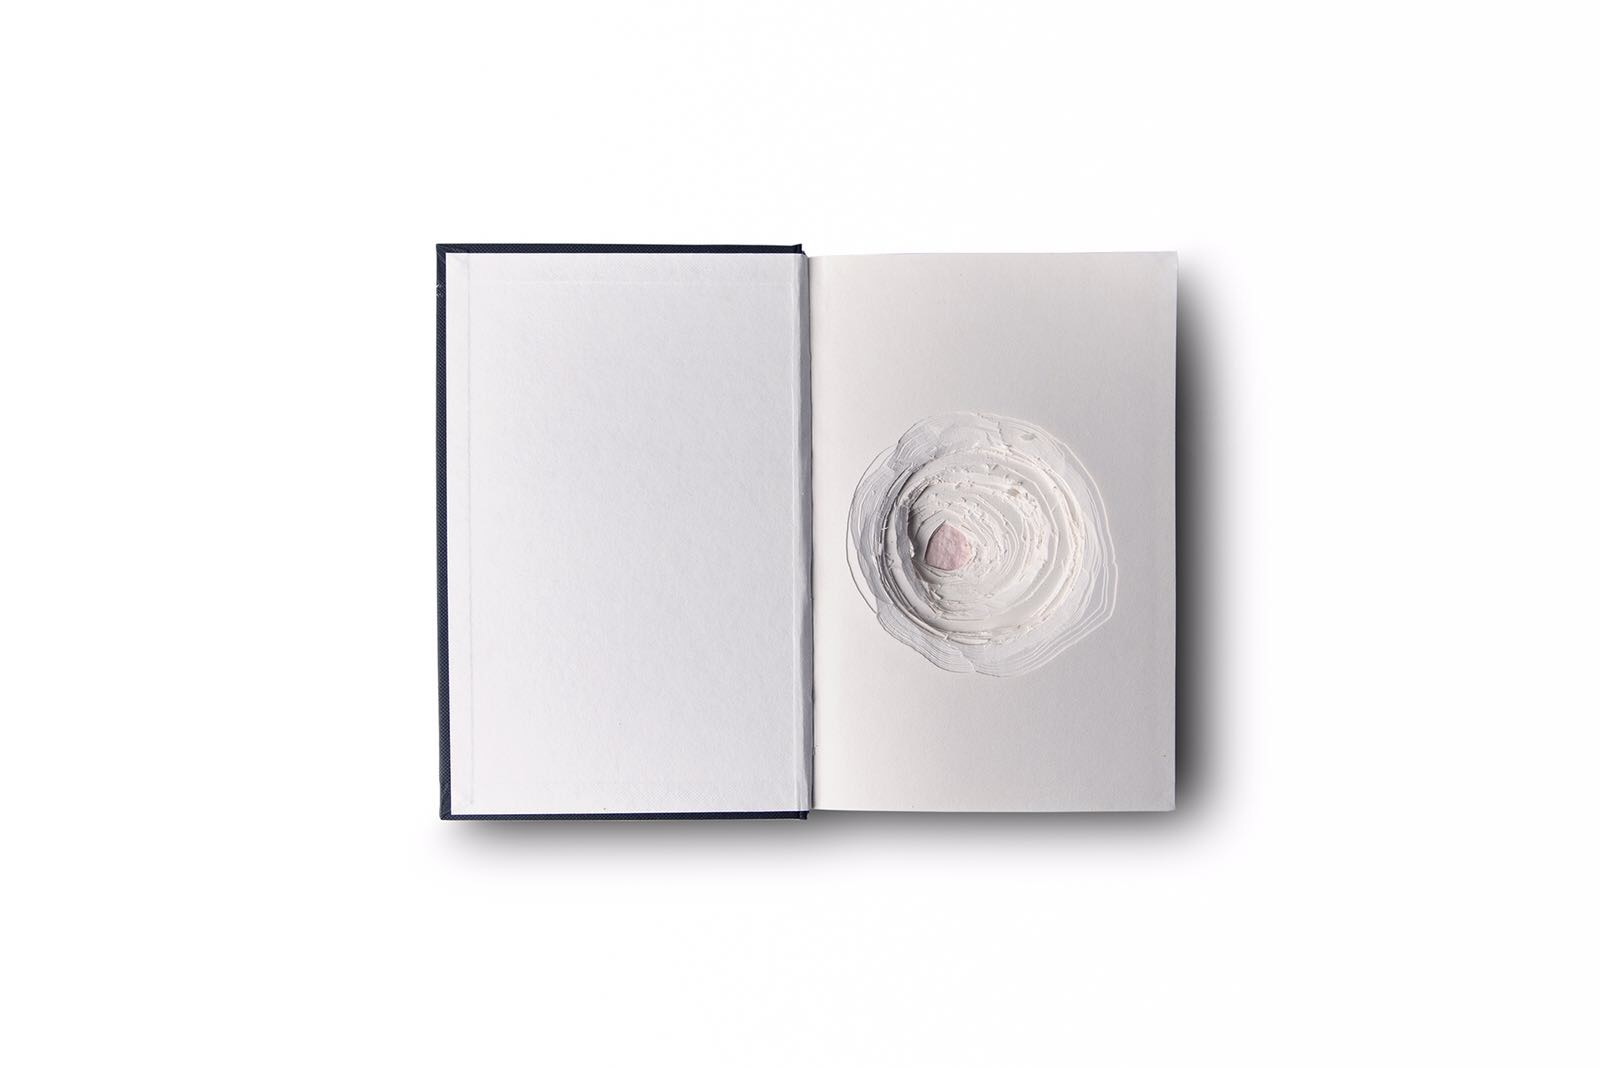 Eda Aslan, Blind Well, book, 2015.